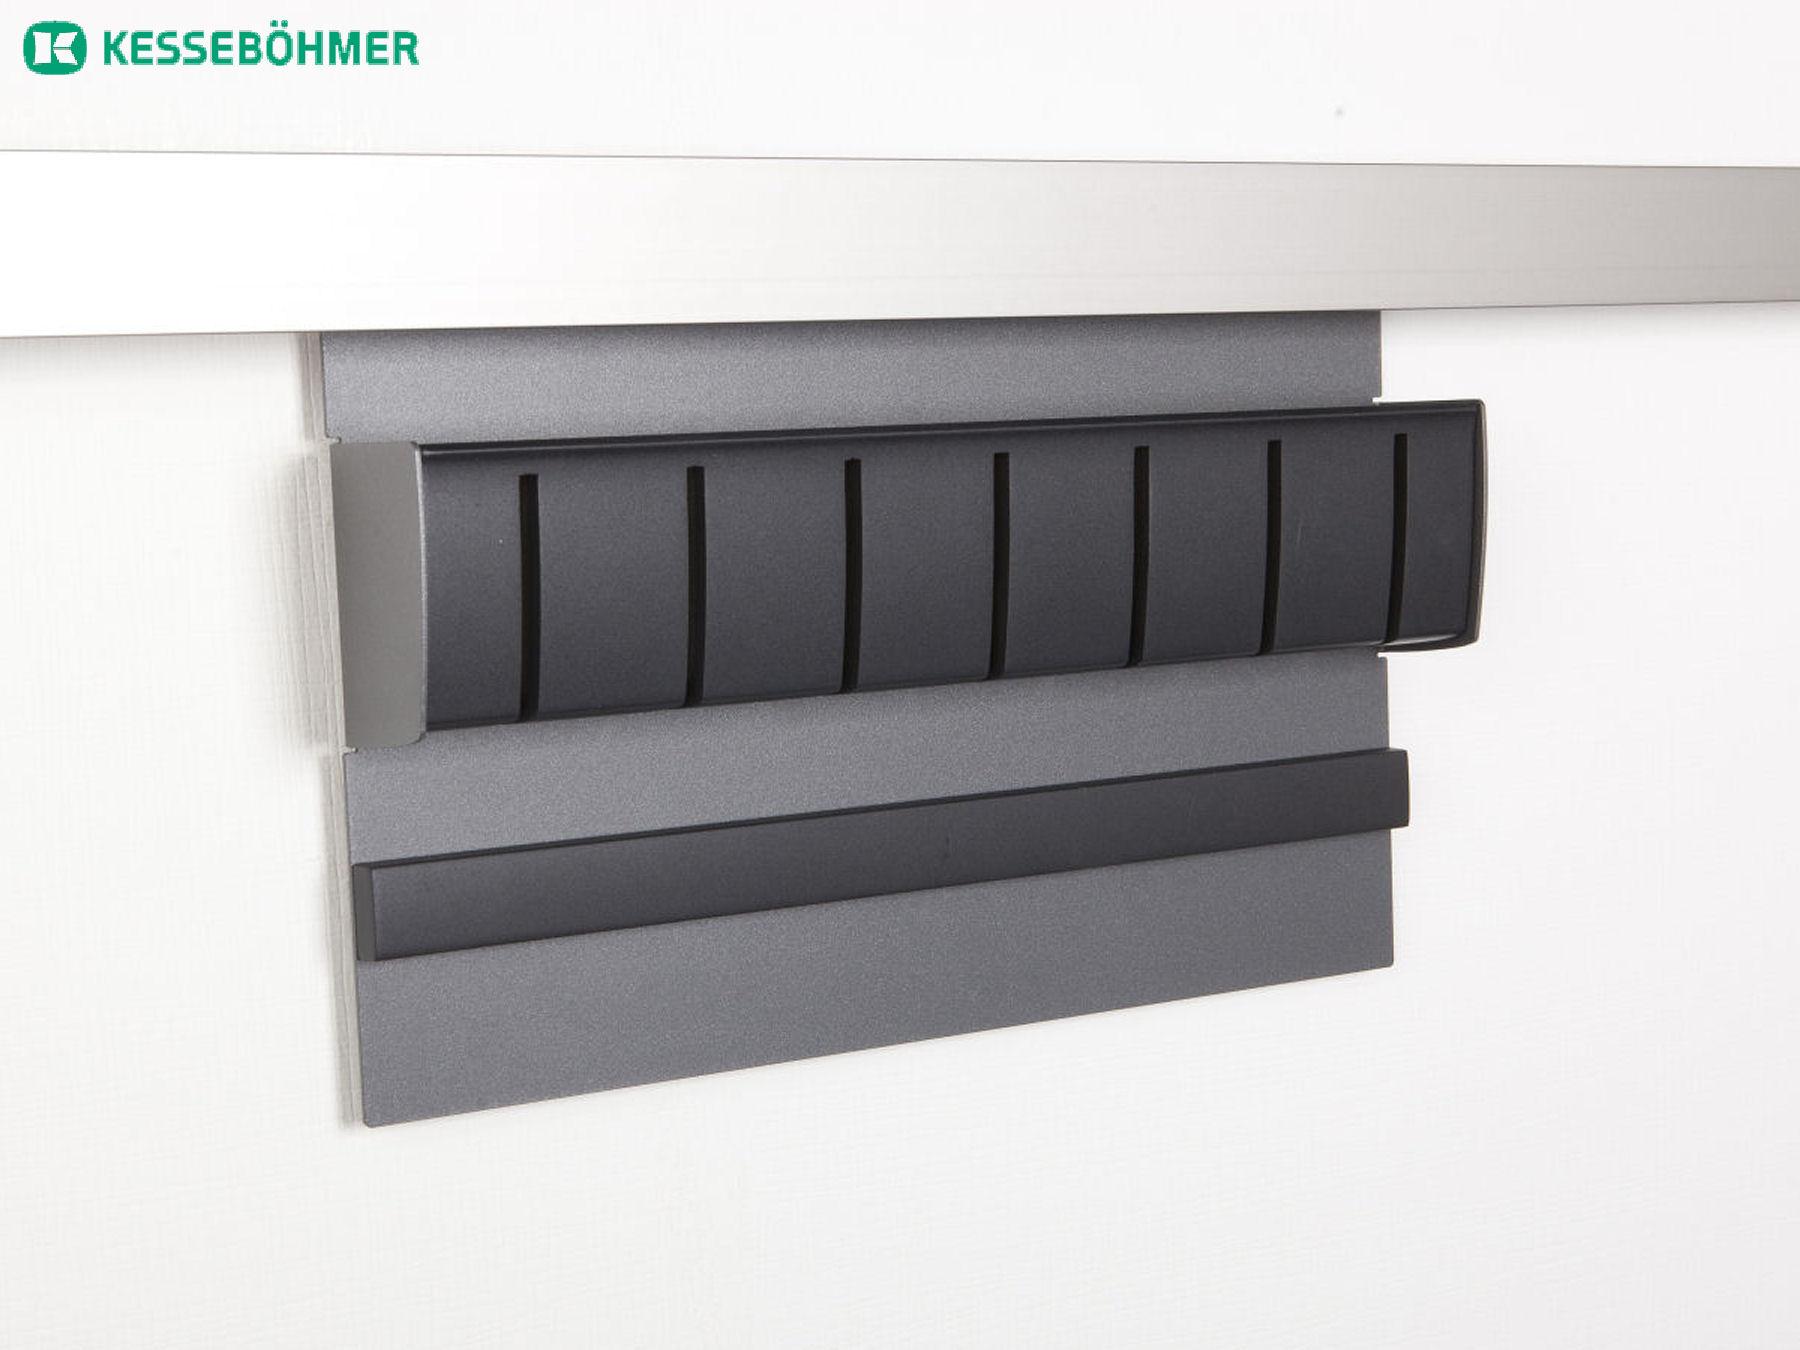 Iphone Entfernungsmesser Ikea : Küchen teleskopstange mit korb ikea körbe